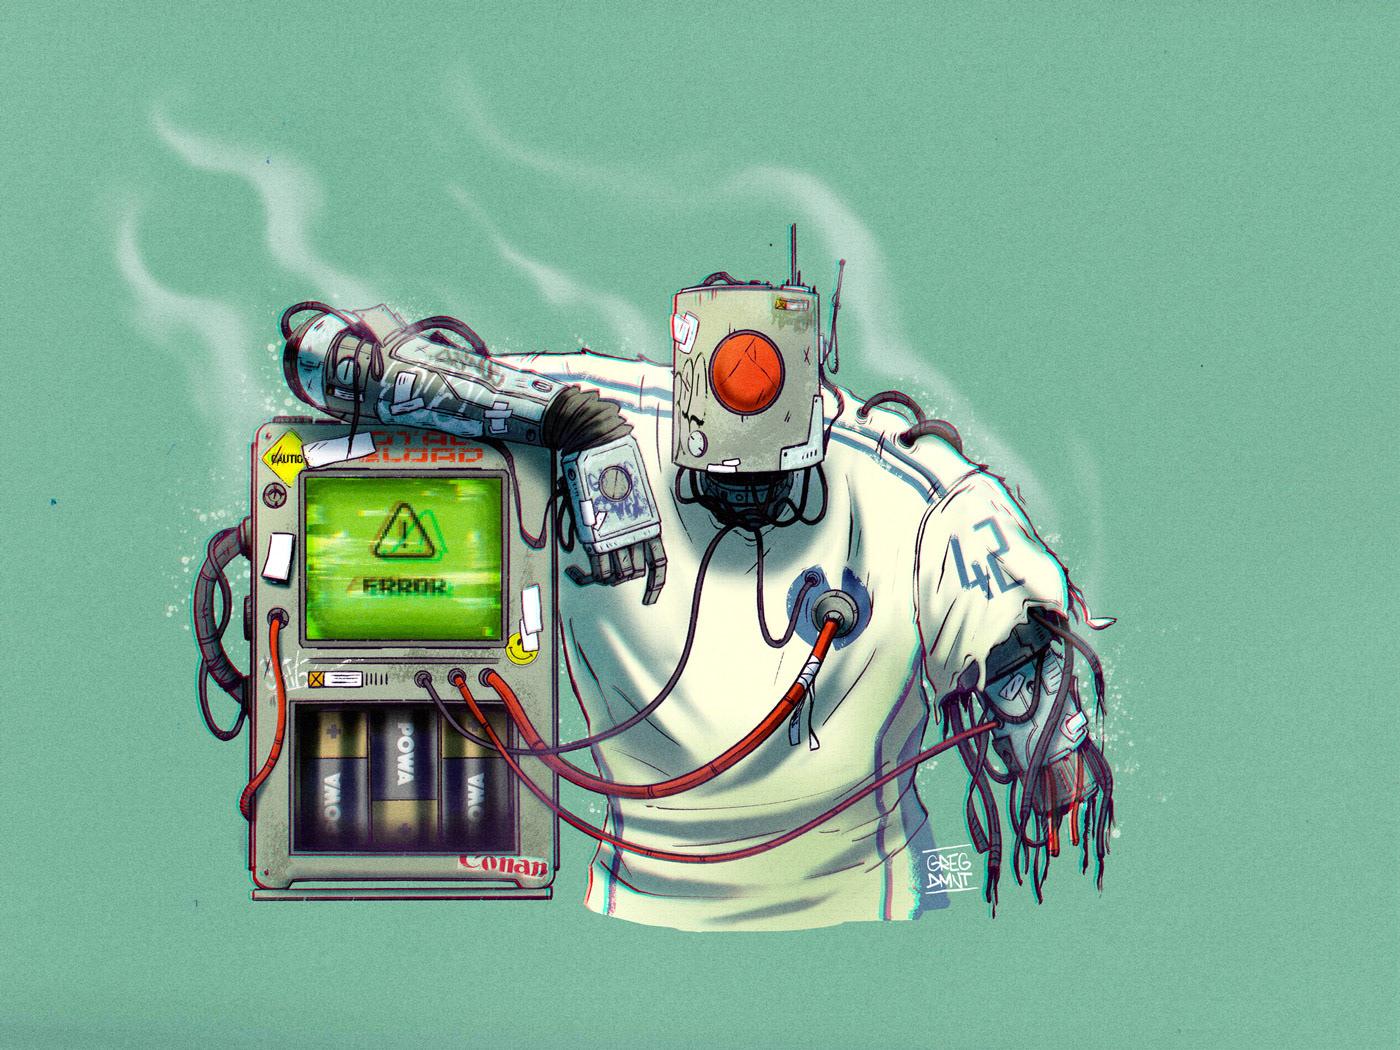 charadesign concept art Cyborg grapheart gregdmnt machine mecha robotdesign   robots Graffiti